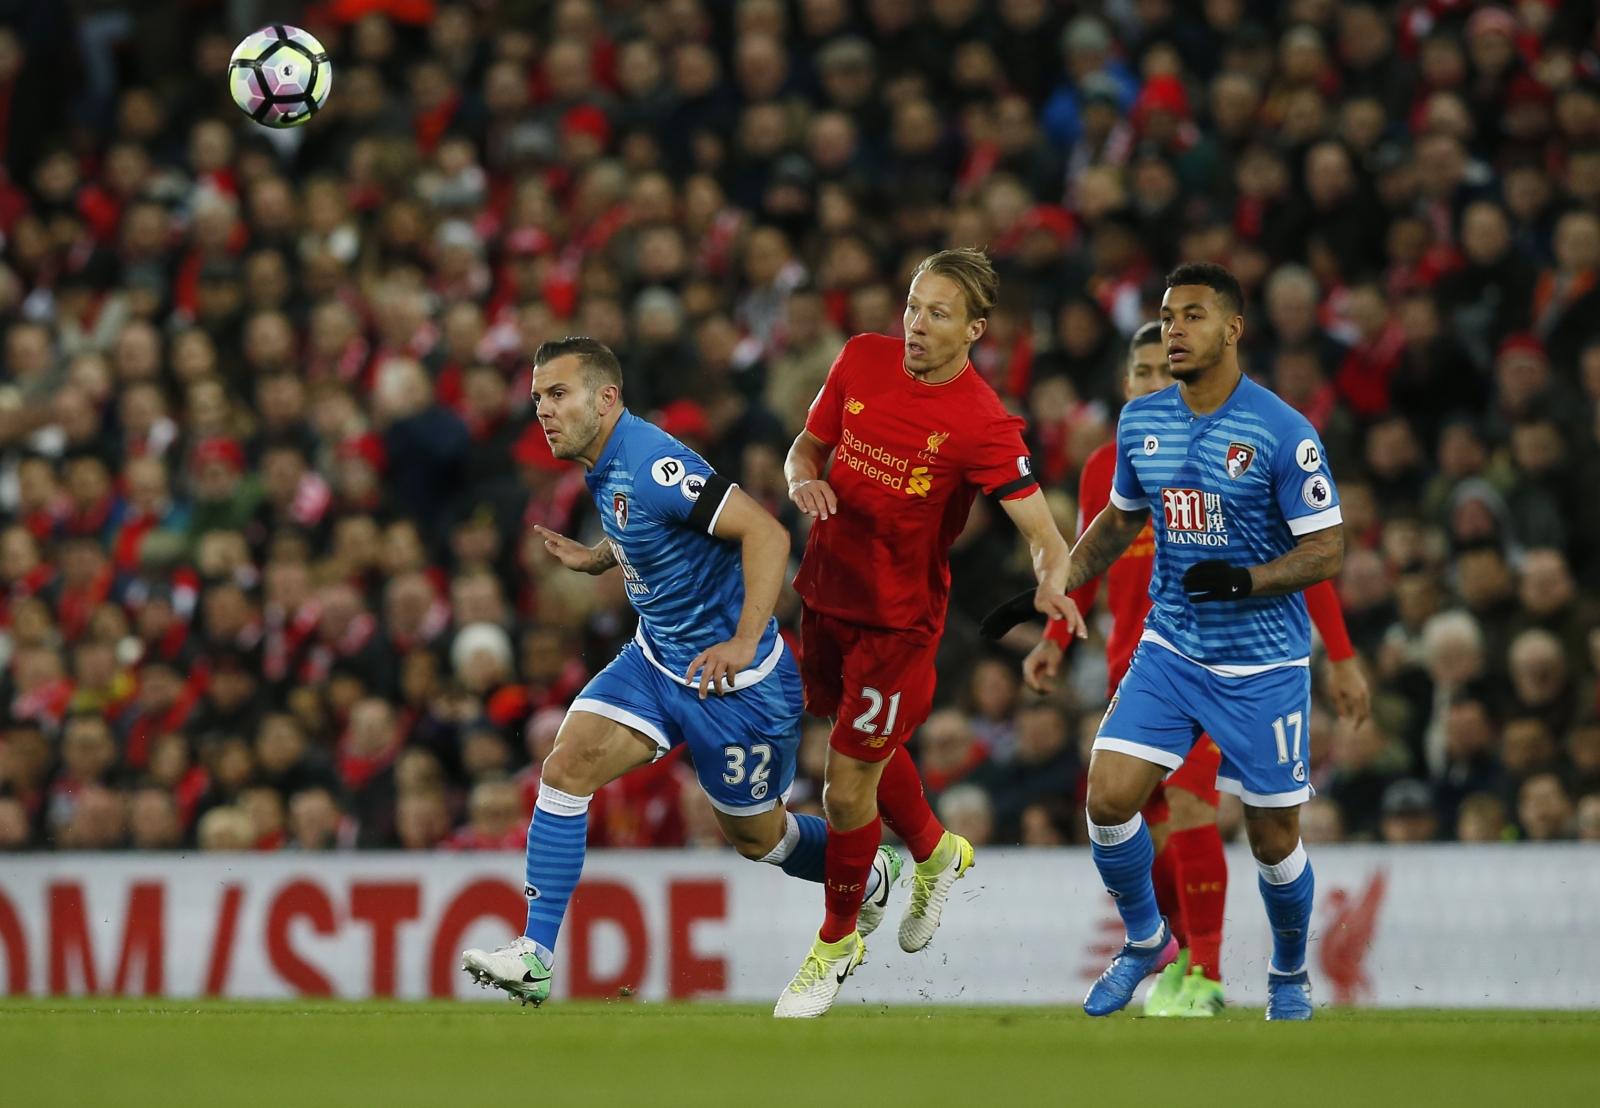 Liverpool Vs Bournemouth Live: Liverpool 1-1 Bournemouth: Premier League